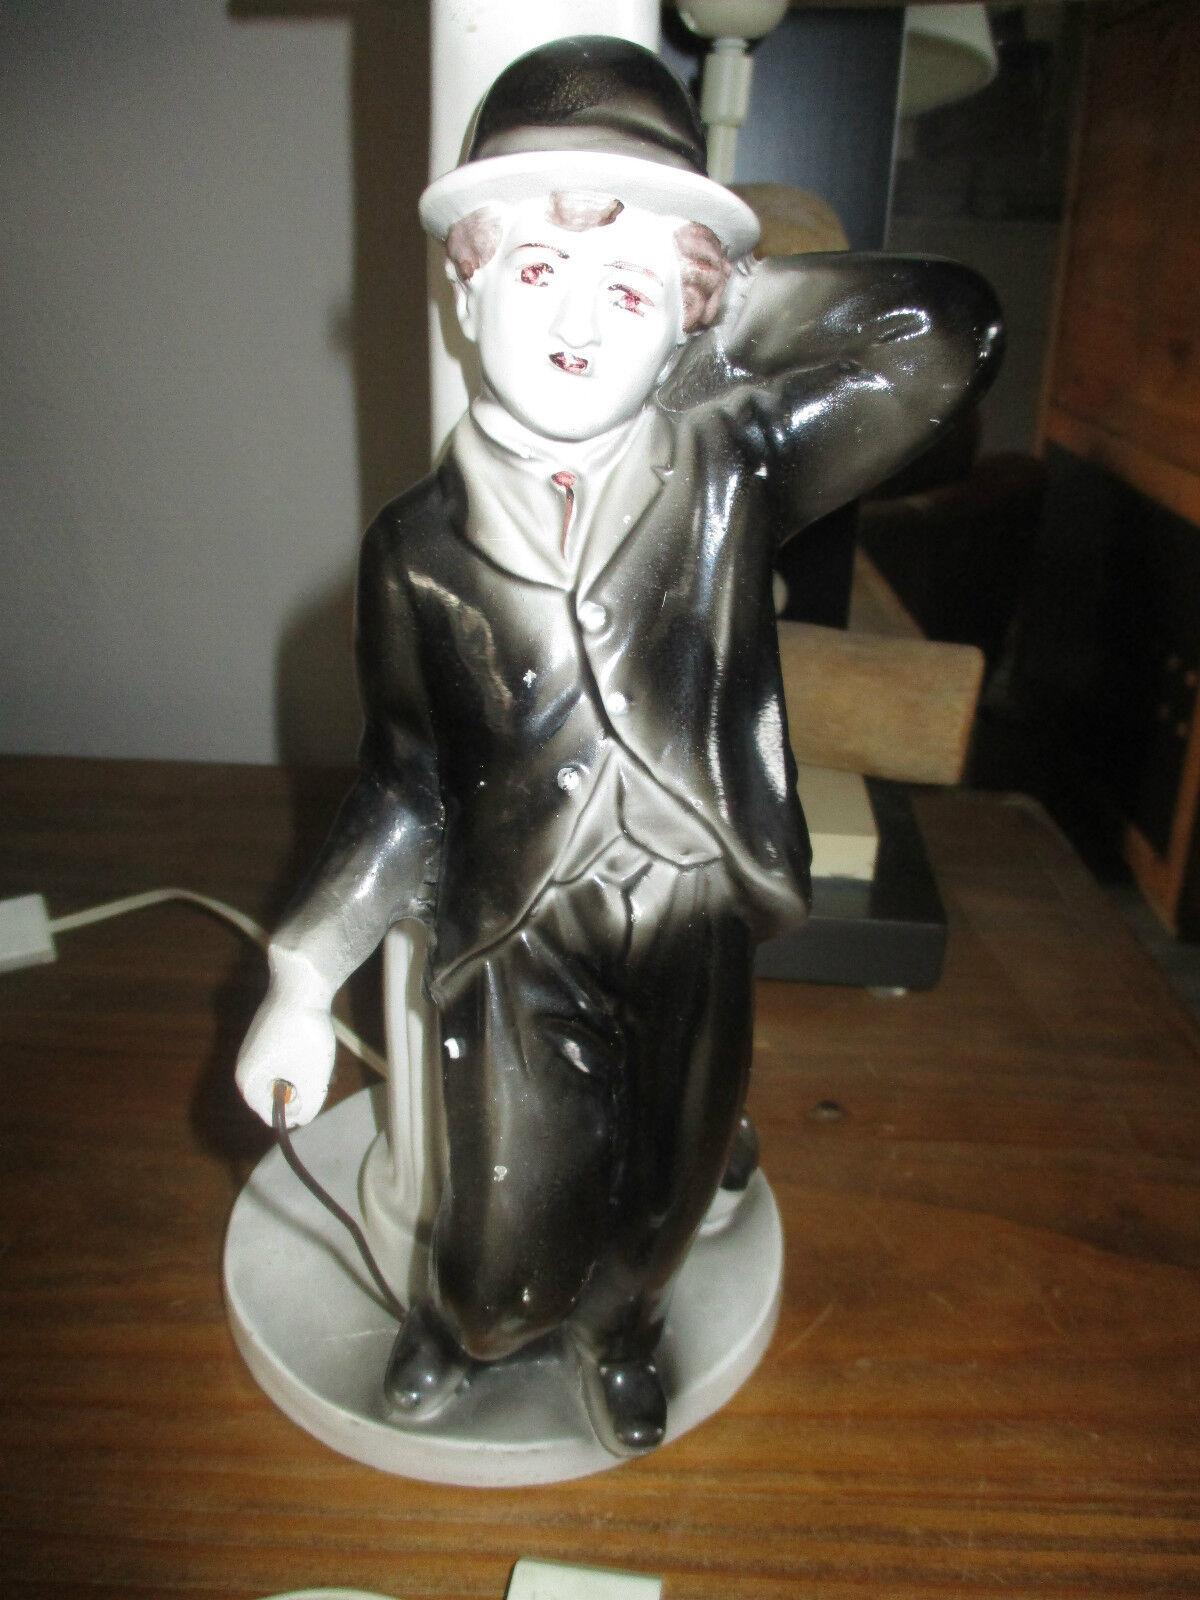 Das è mich cin é ma vintage ancienne lampe charlie chaplin grand mod è le formacion (1970)